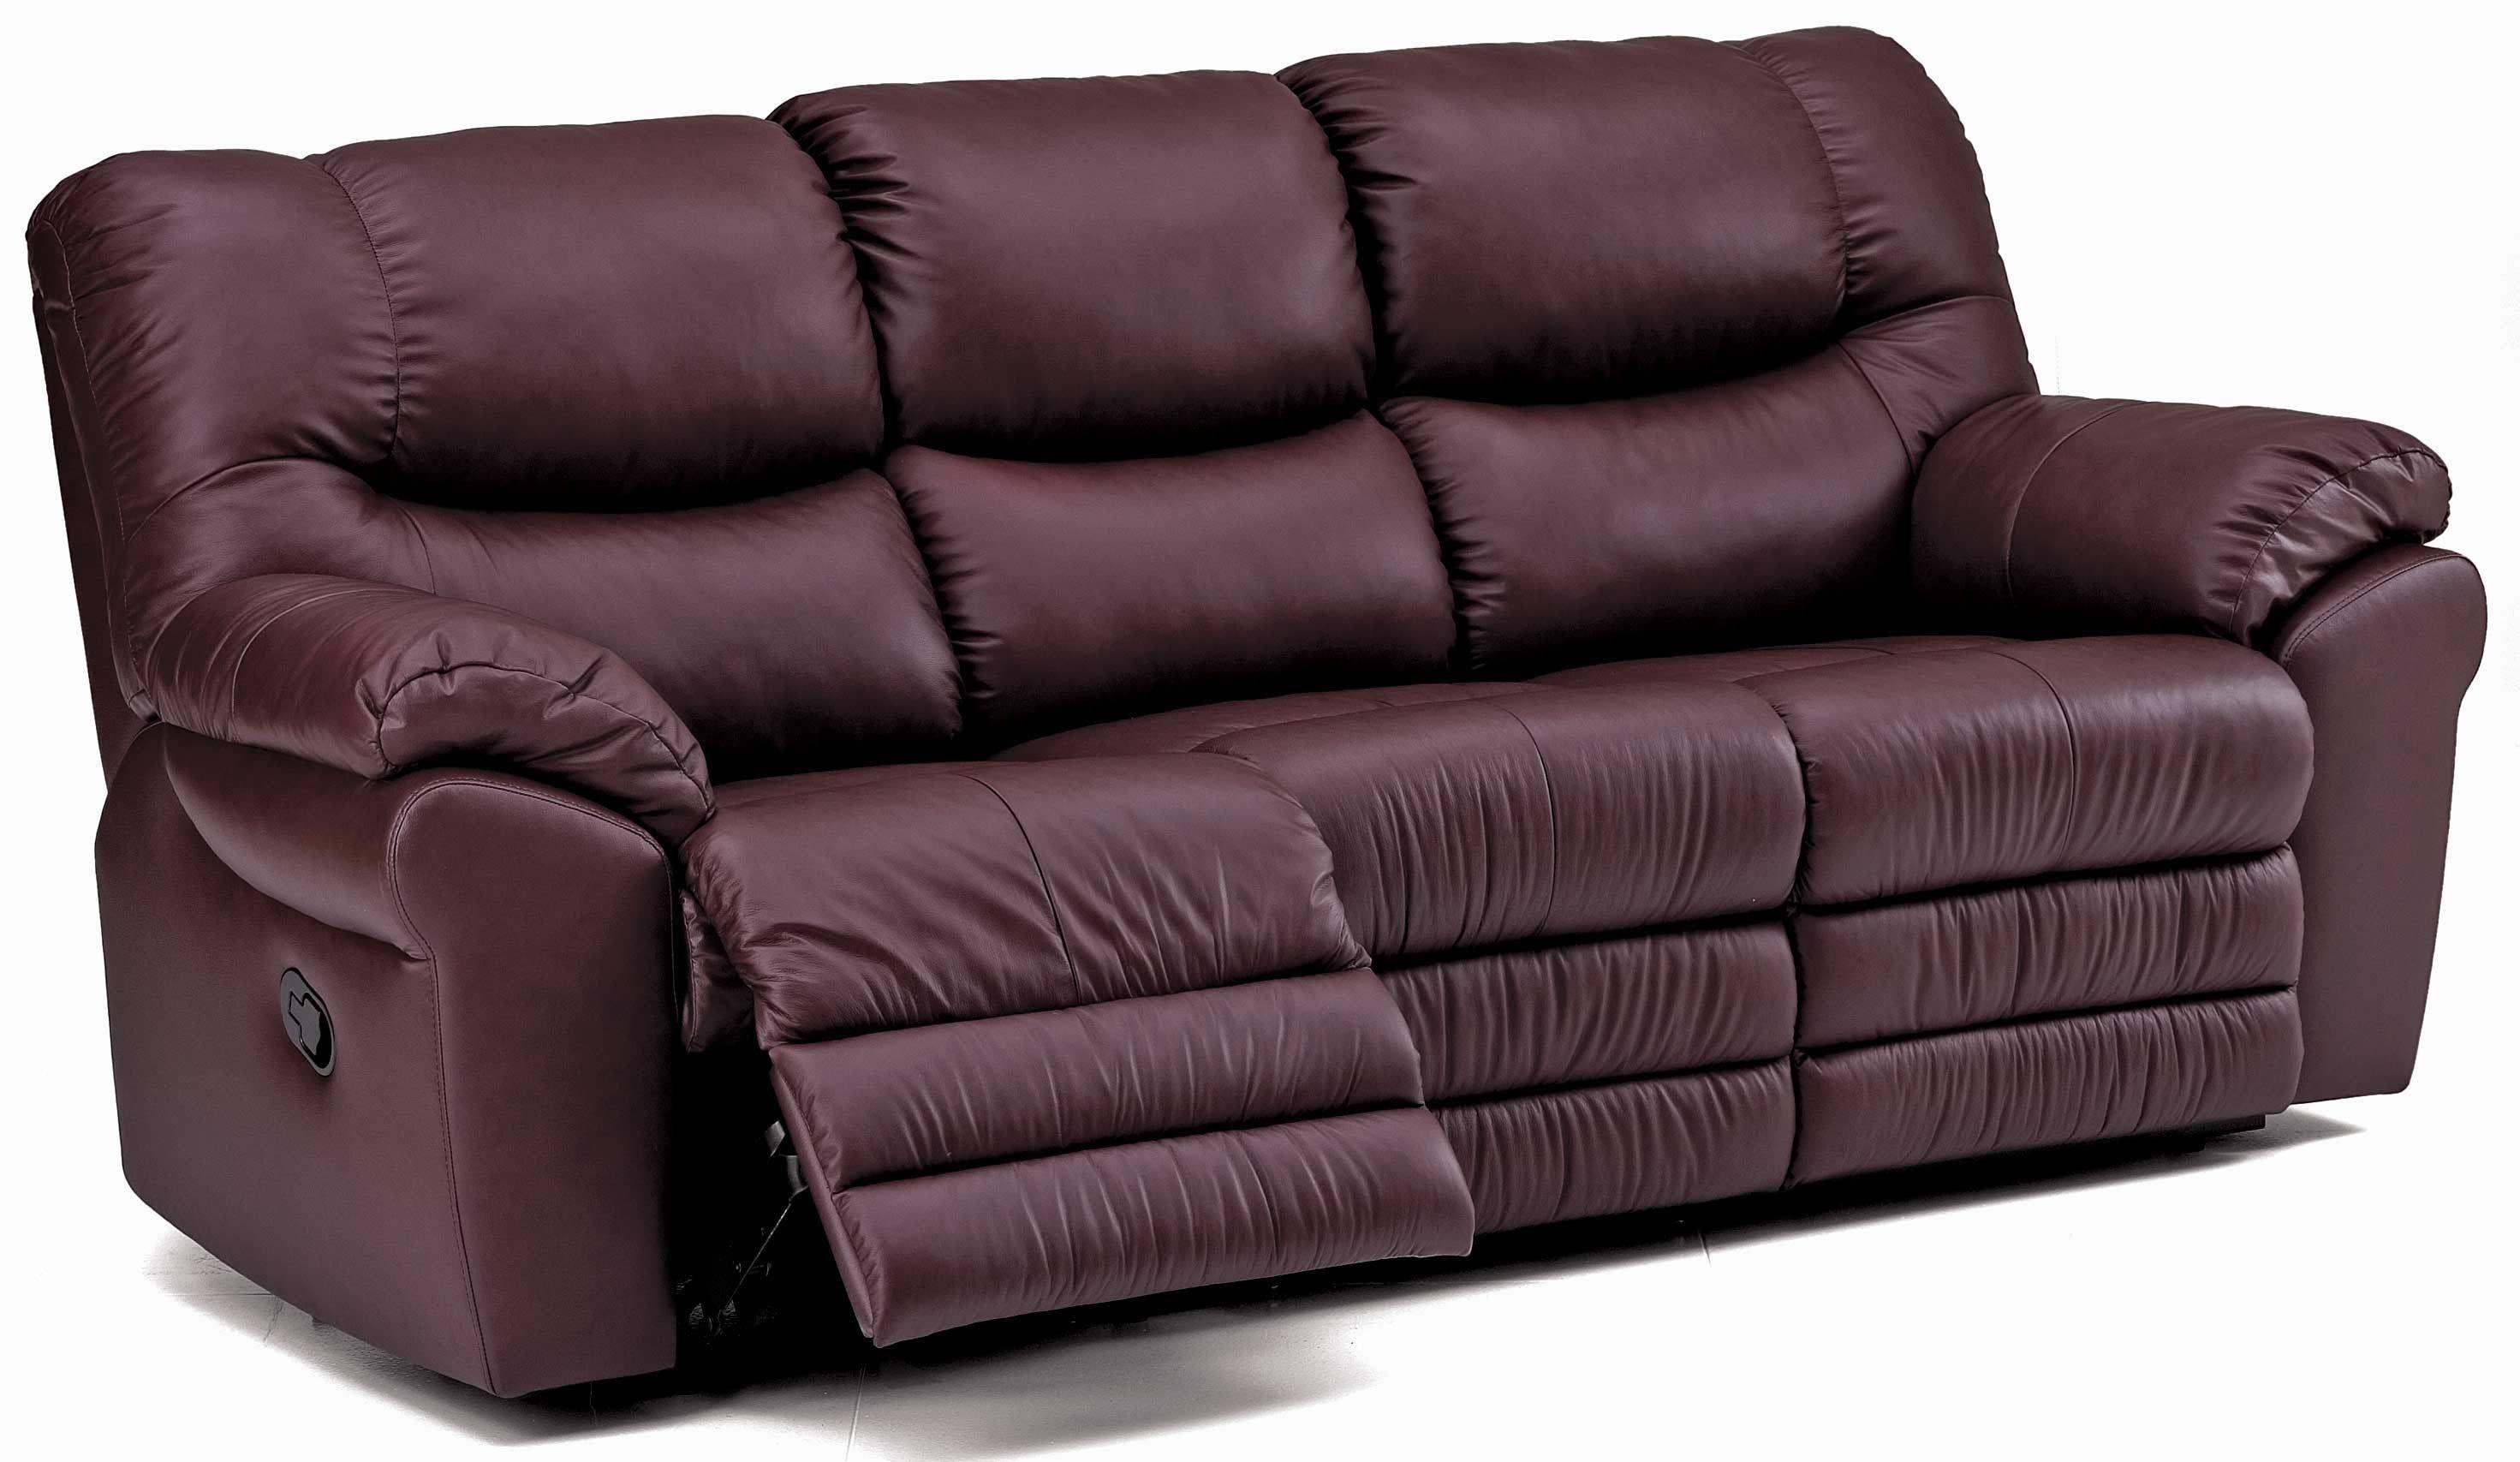 Palliser Divo Sofa Recliner Palliser Furniture Leather Furniture Reclining Sofa